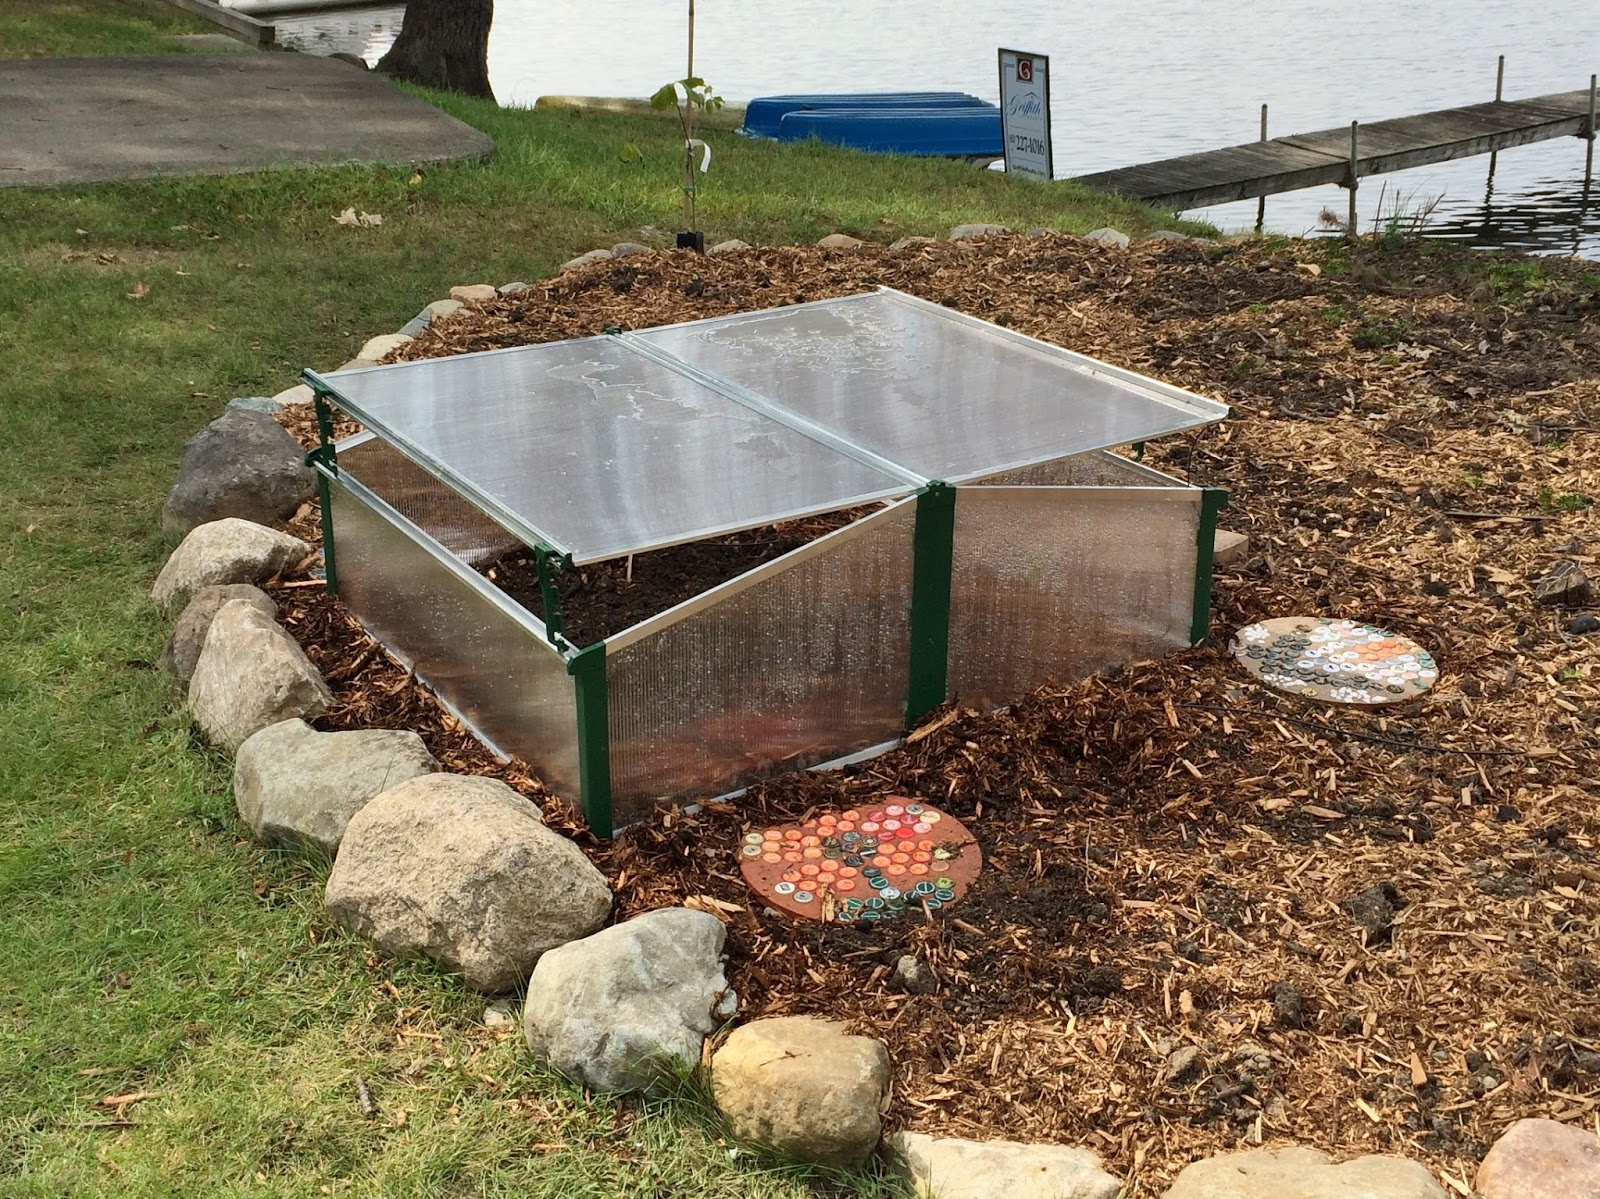 MI Lake Home Garden: Winter Gardening in Michigan Experiment & 38 ...